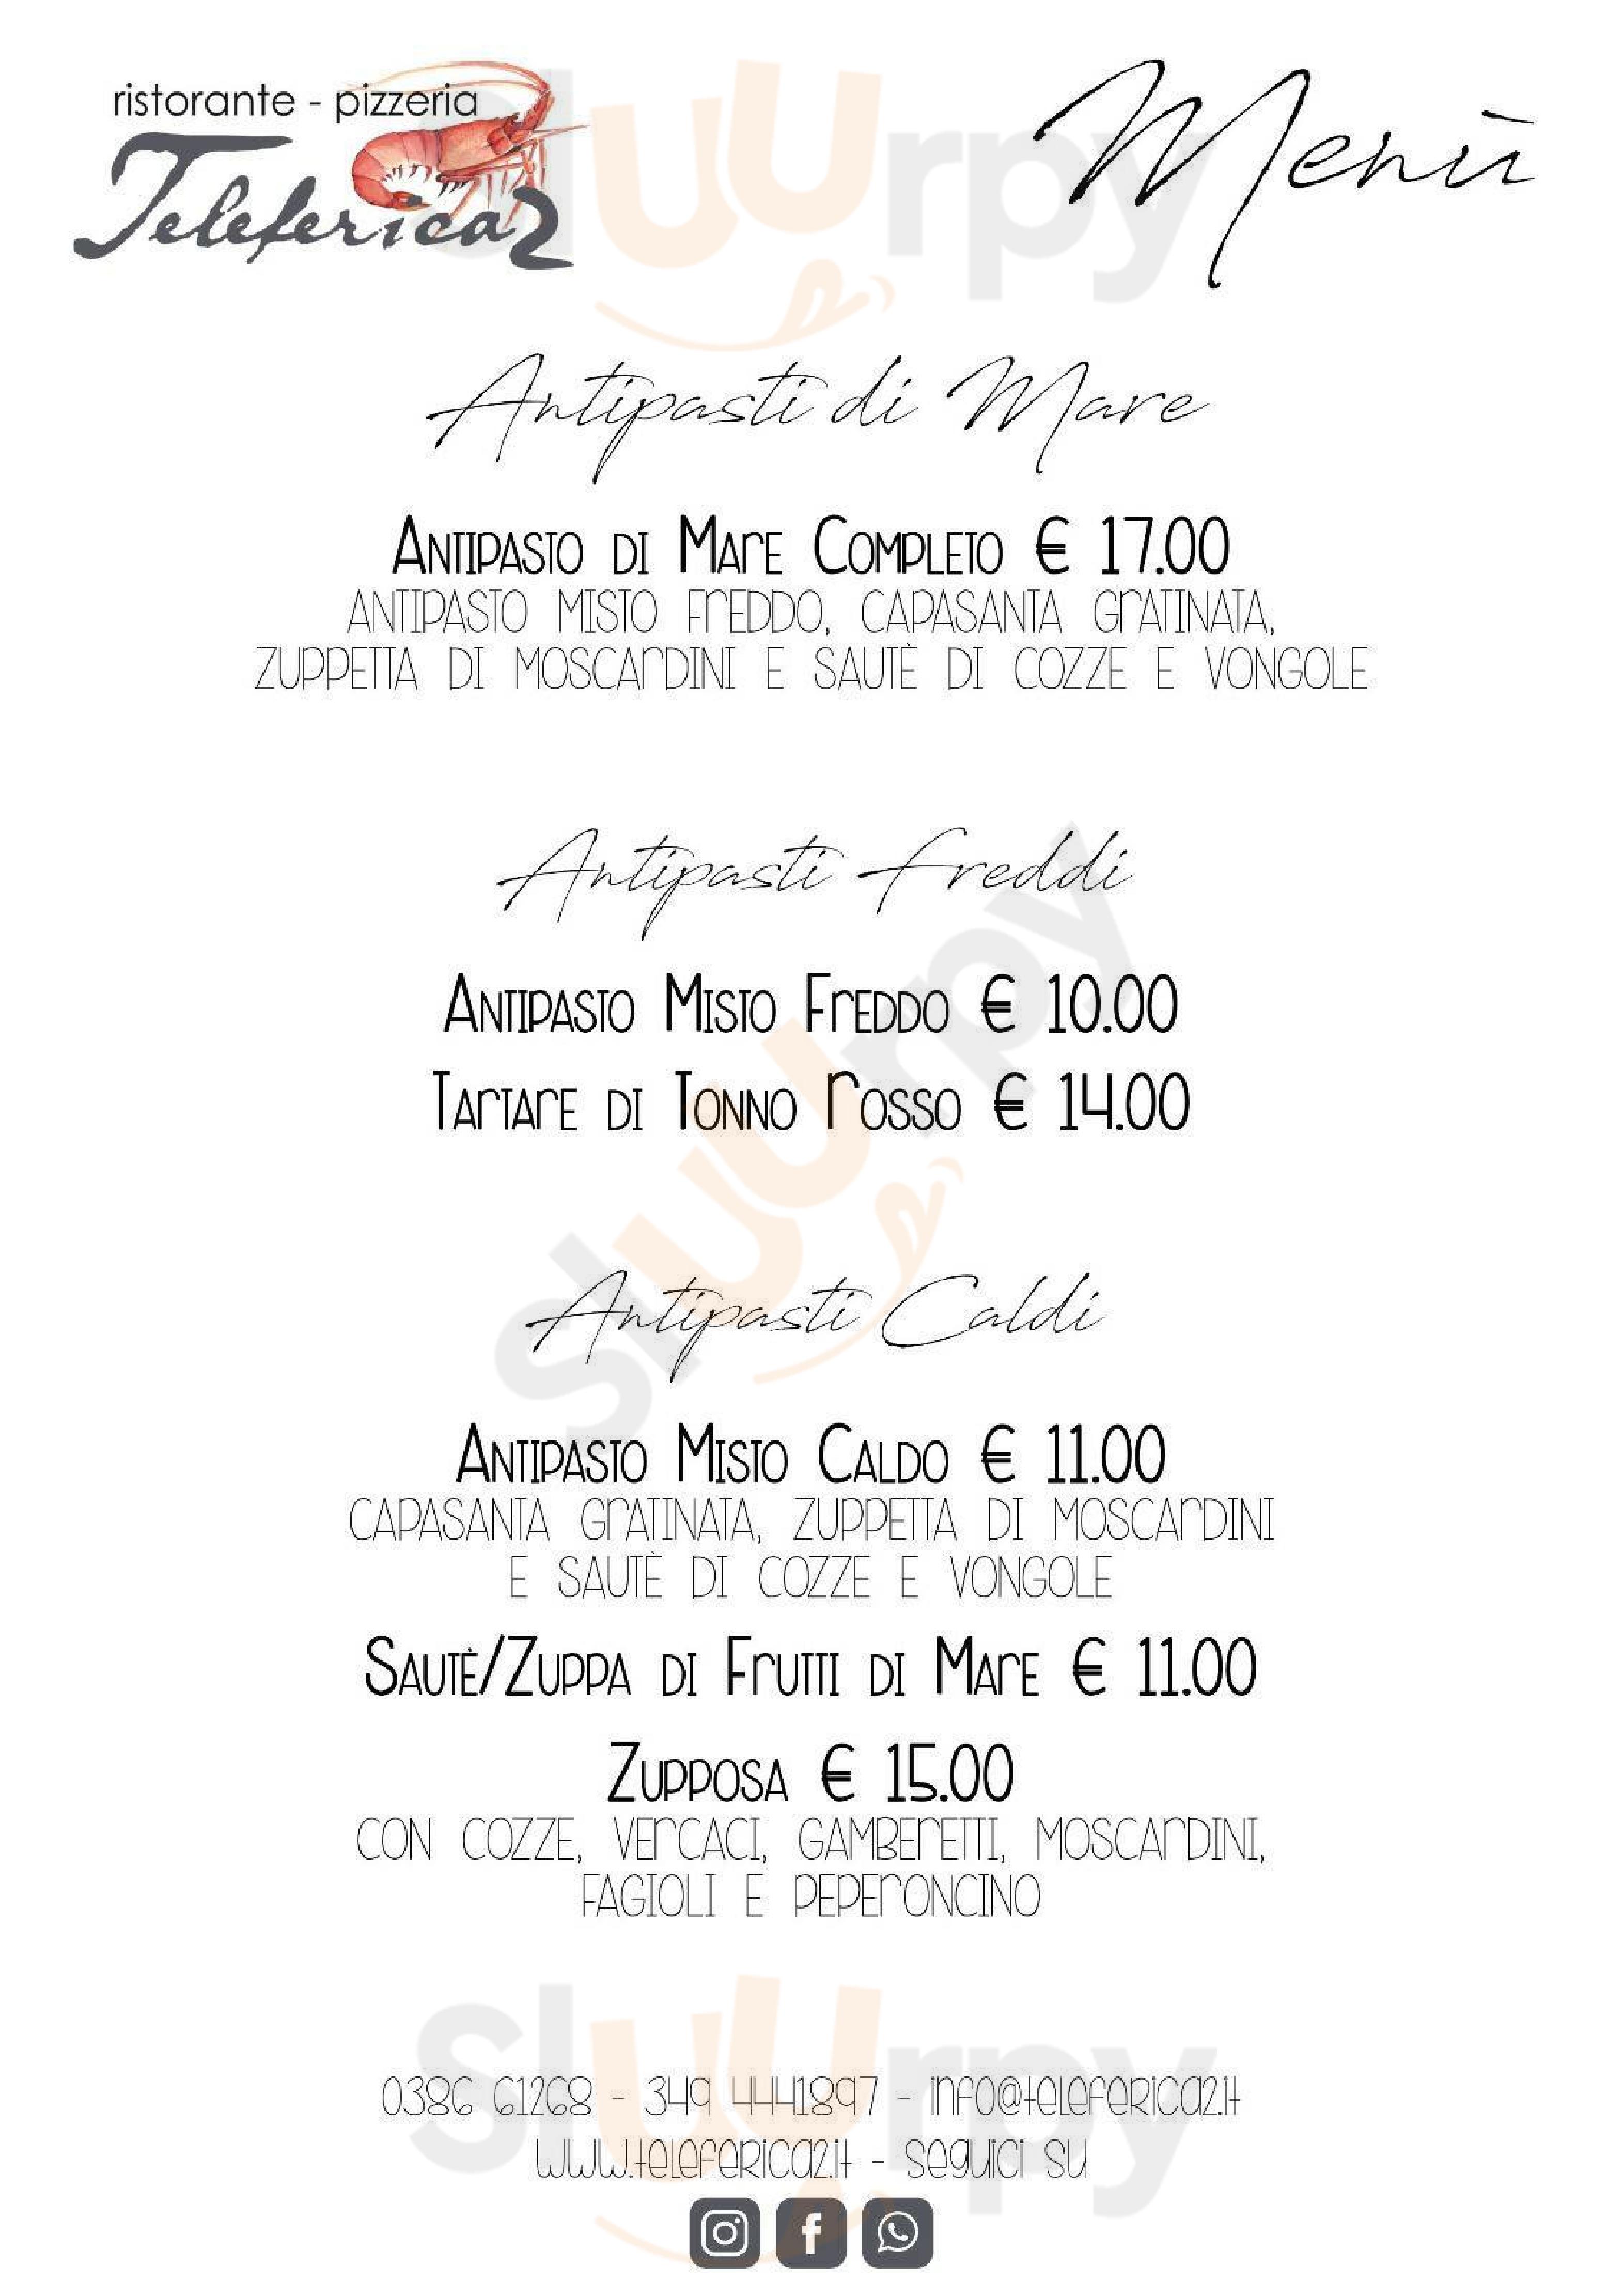 Ristorante Pizzeria Teleferica2 Sermide menù 1 pagina